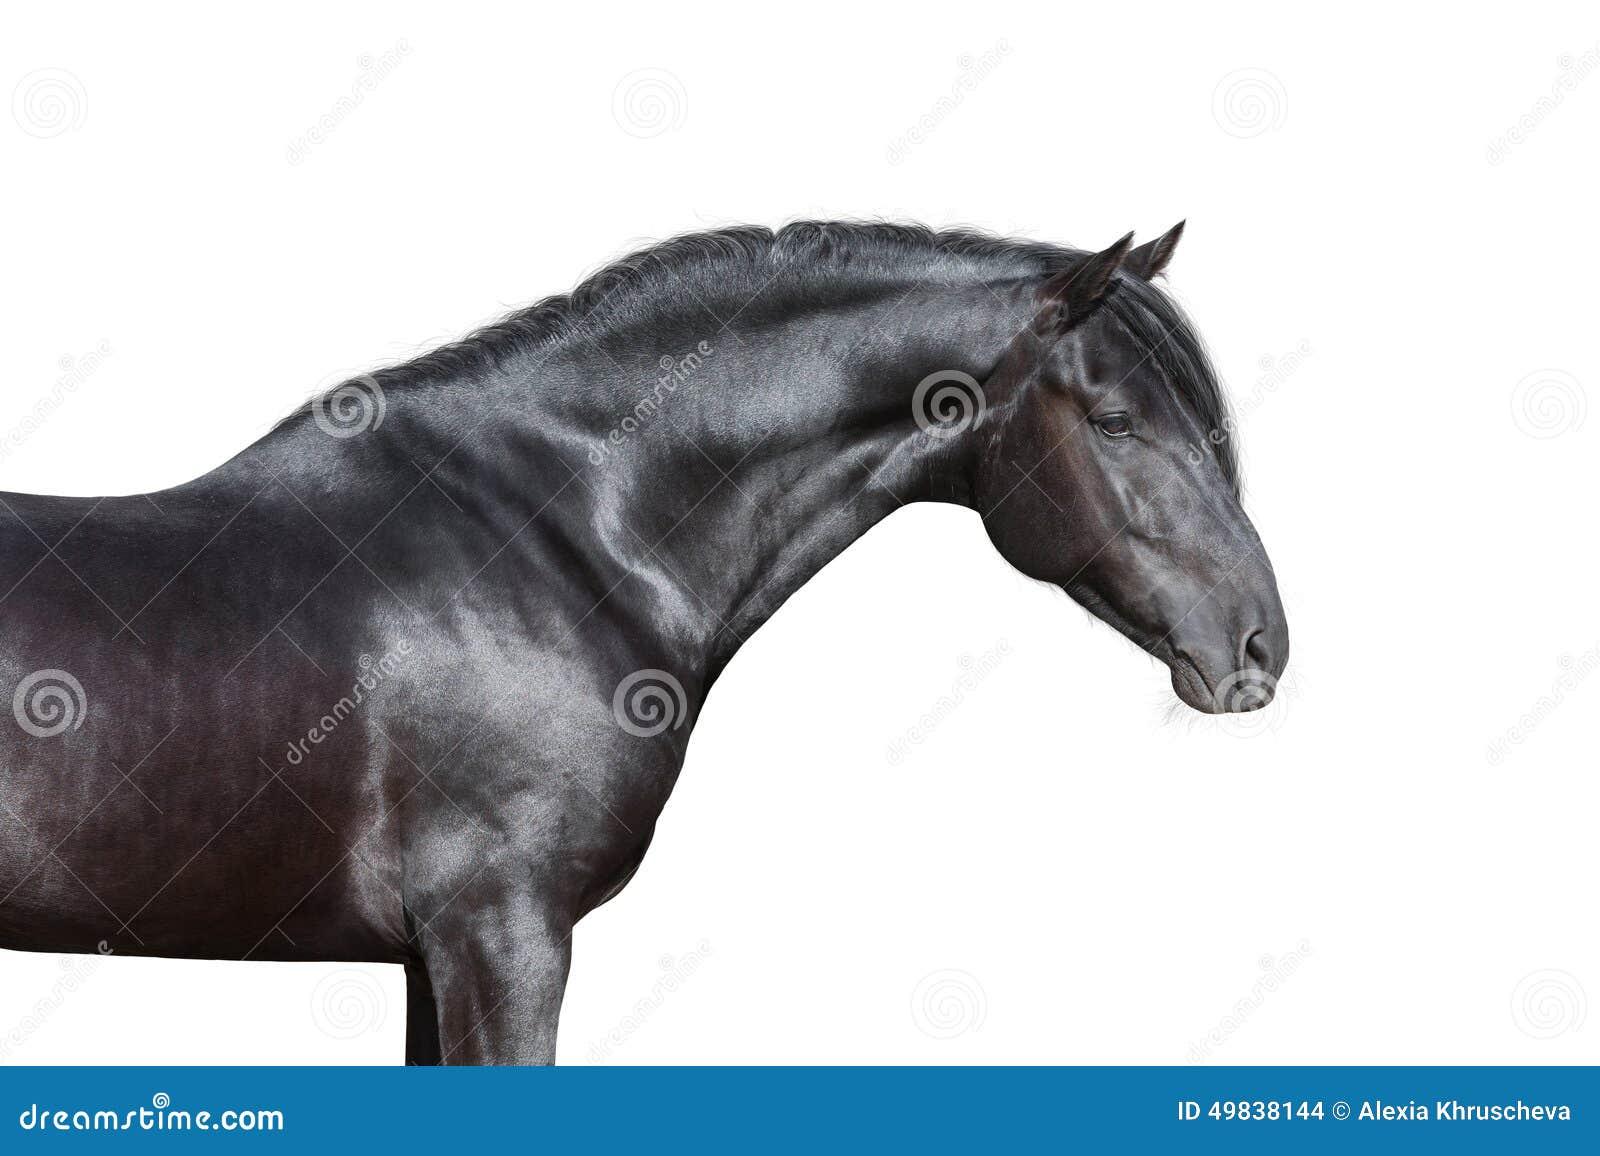 Black Horse Head On White Background Stock Photo Image Of Elegance Head 49838144